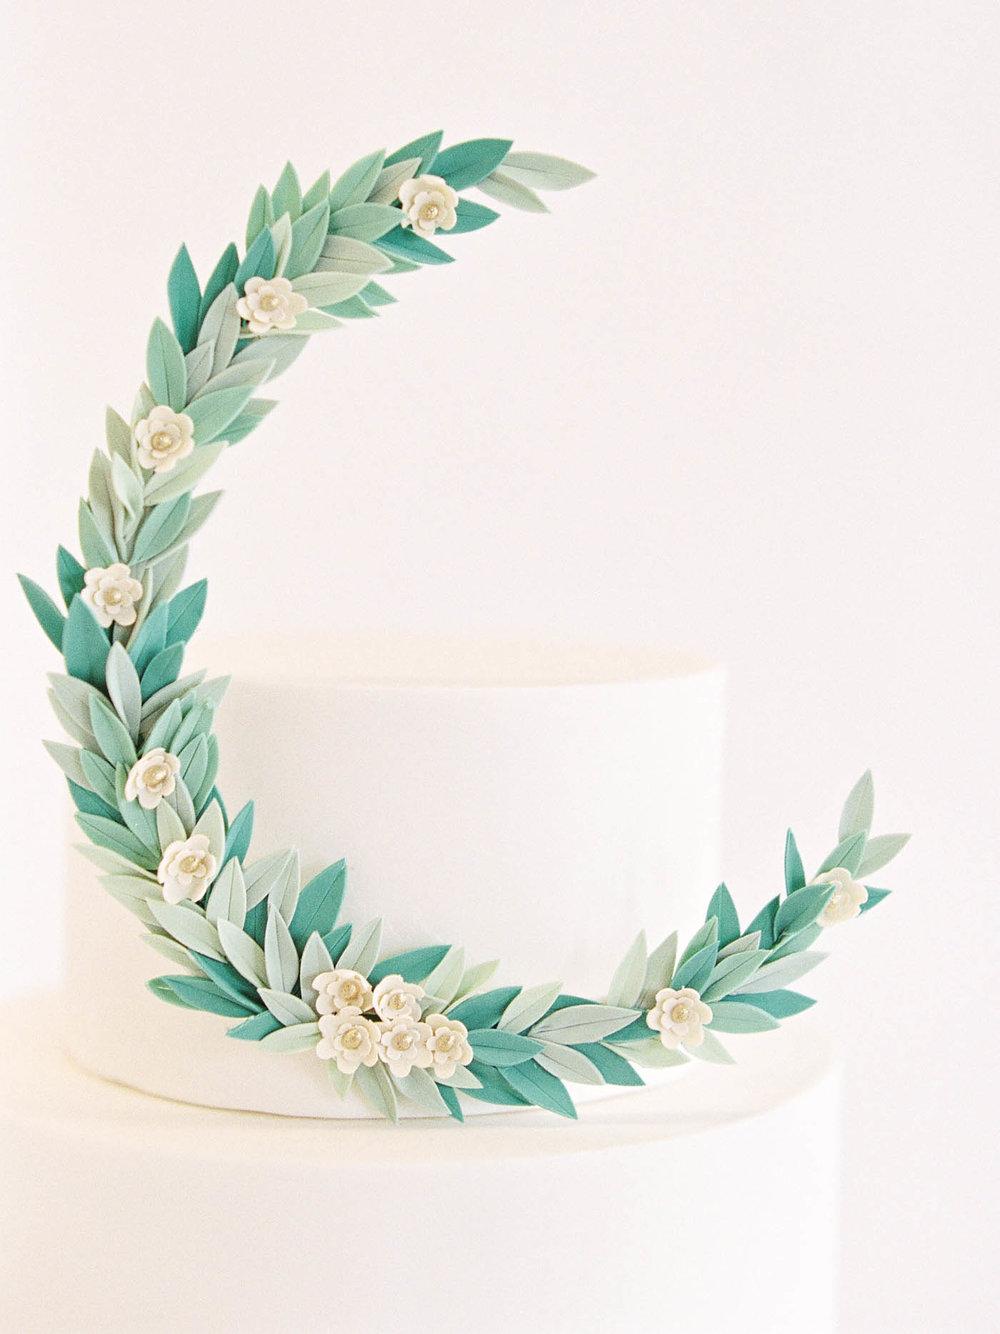 Delicate-Wedding-Cakes-11-Jen_Huang-002343-R1-010.jpg